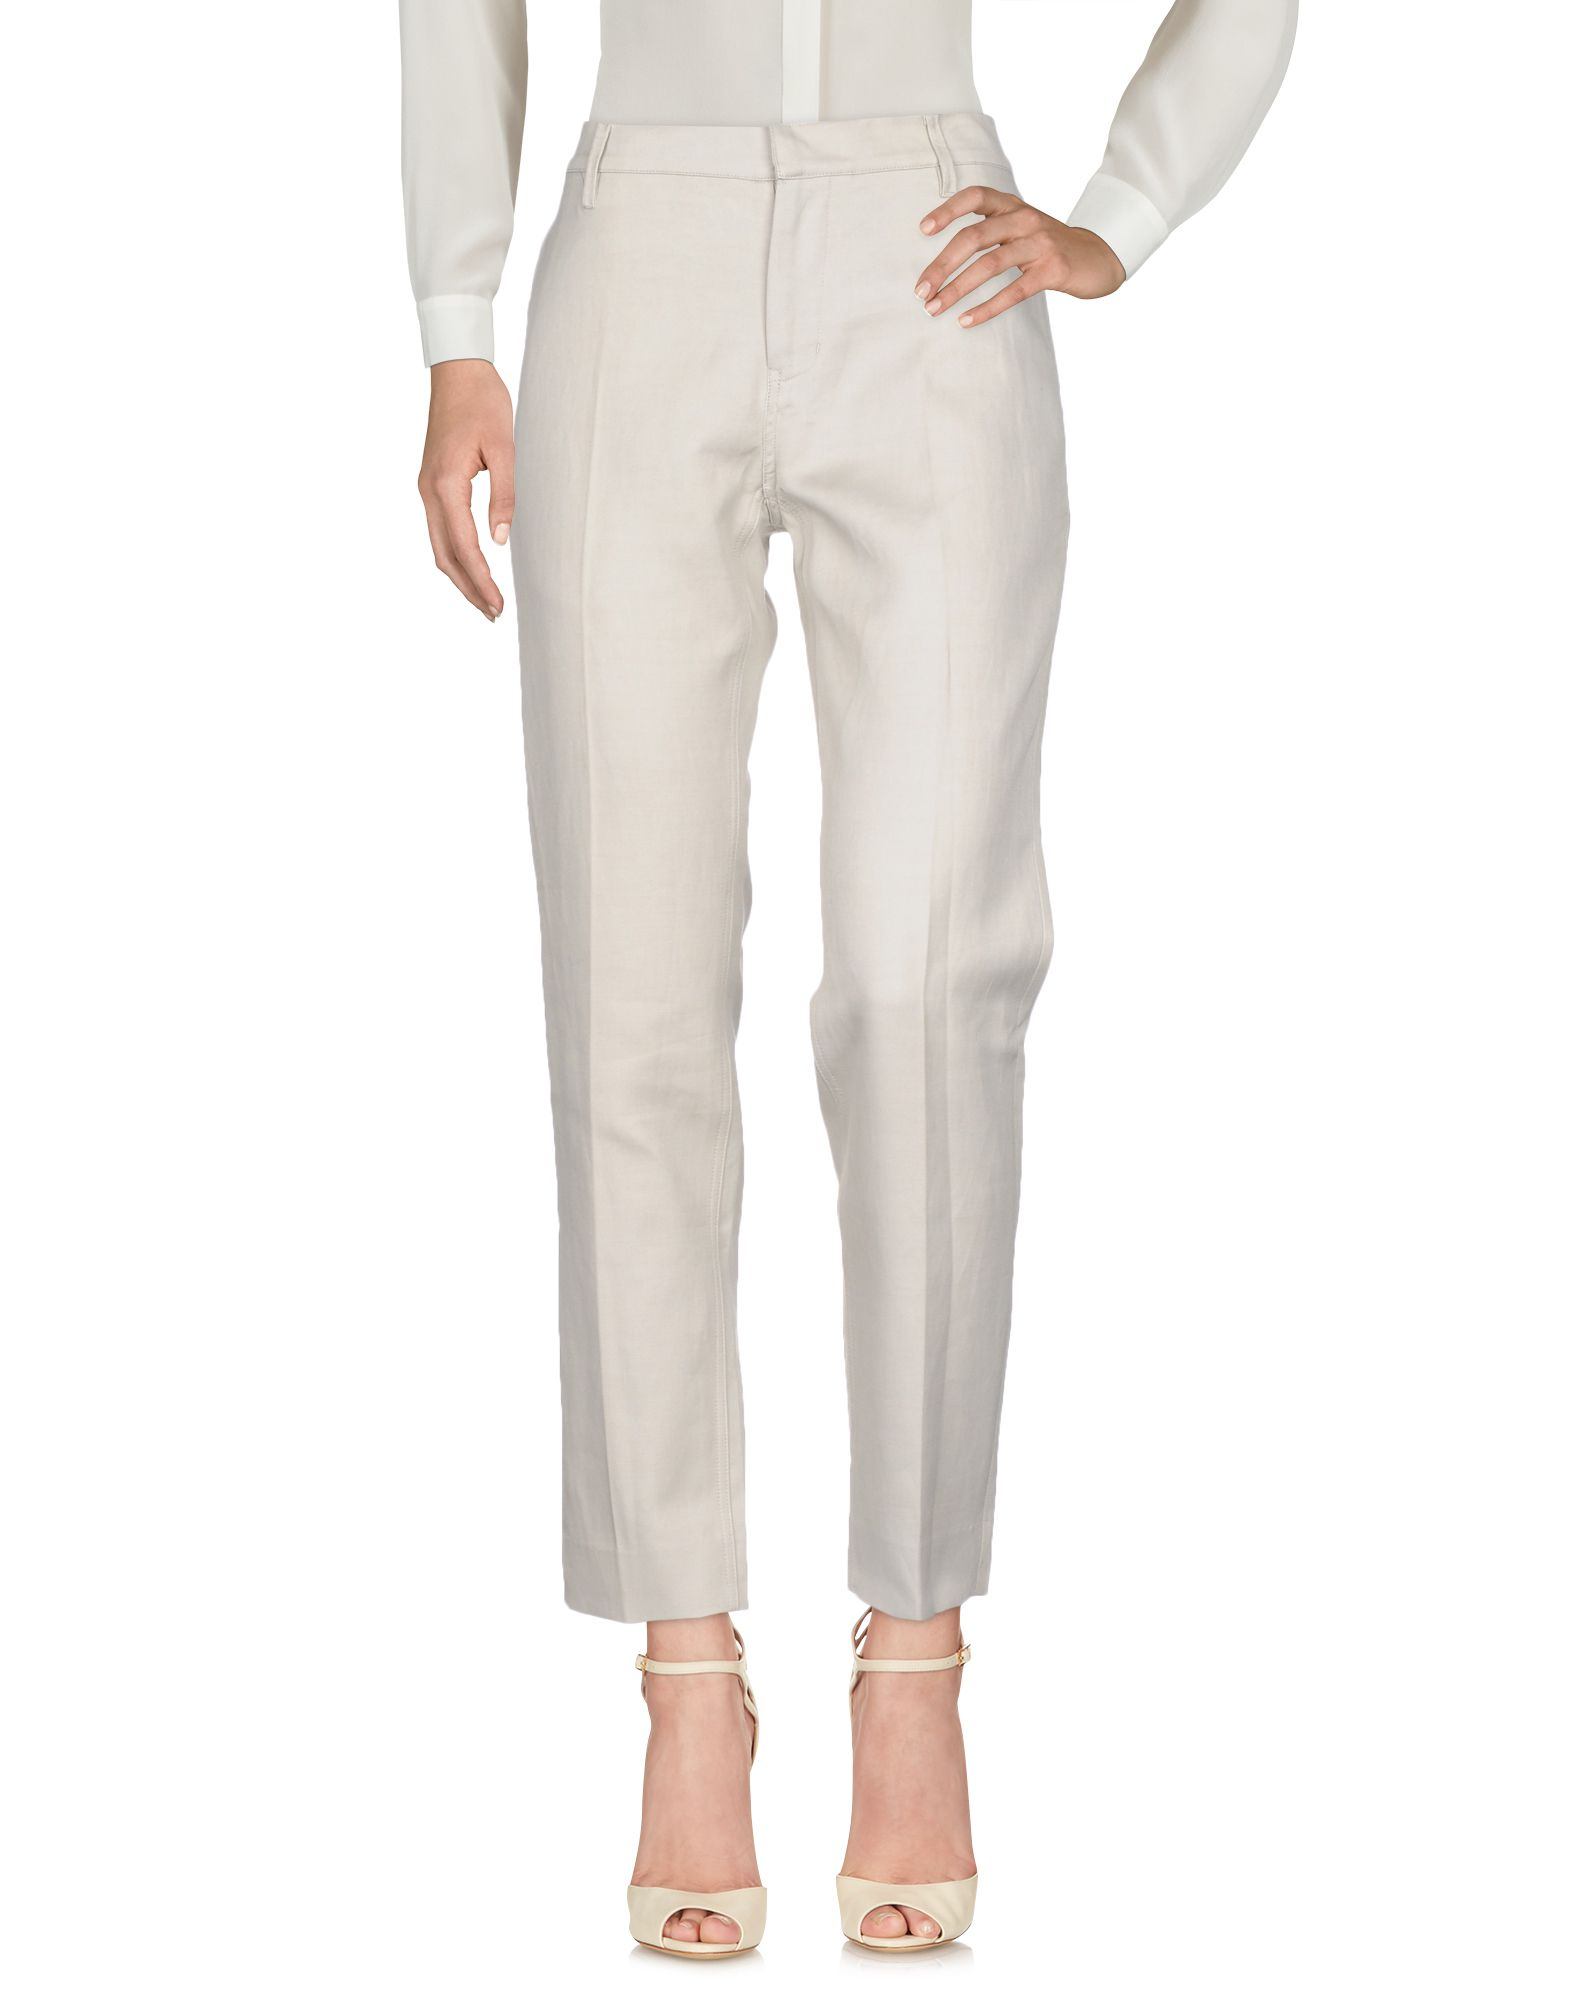 Pantalone Golden Goose Deluxe Brand Donna - Acquista online su znPcBrO